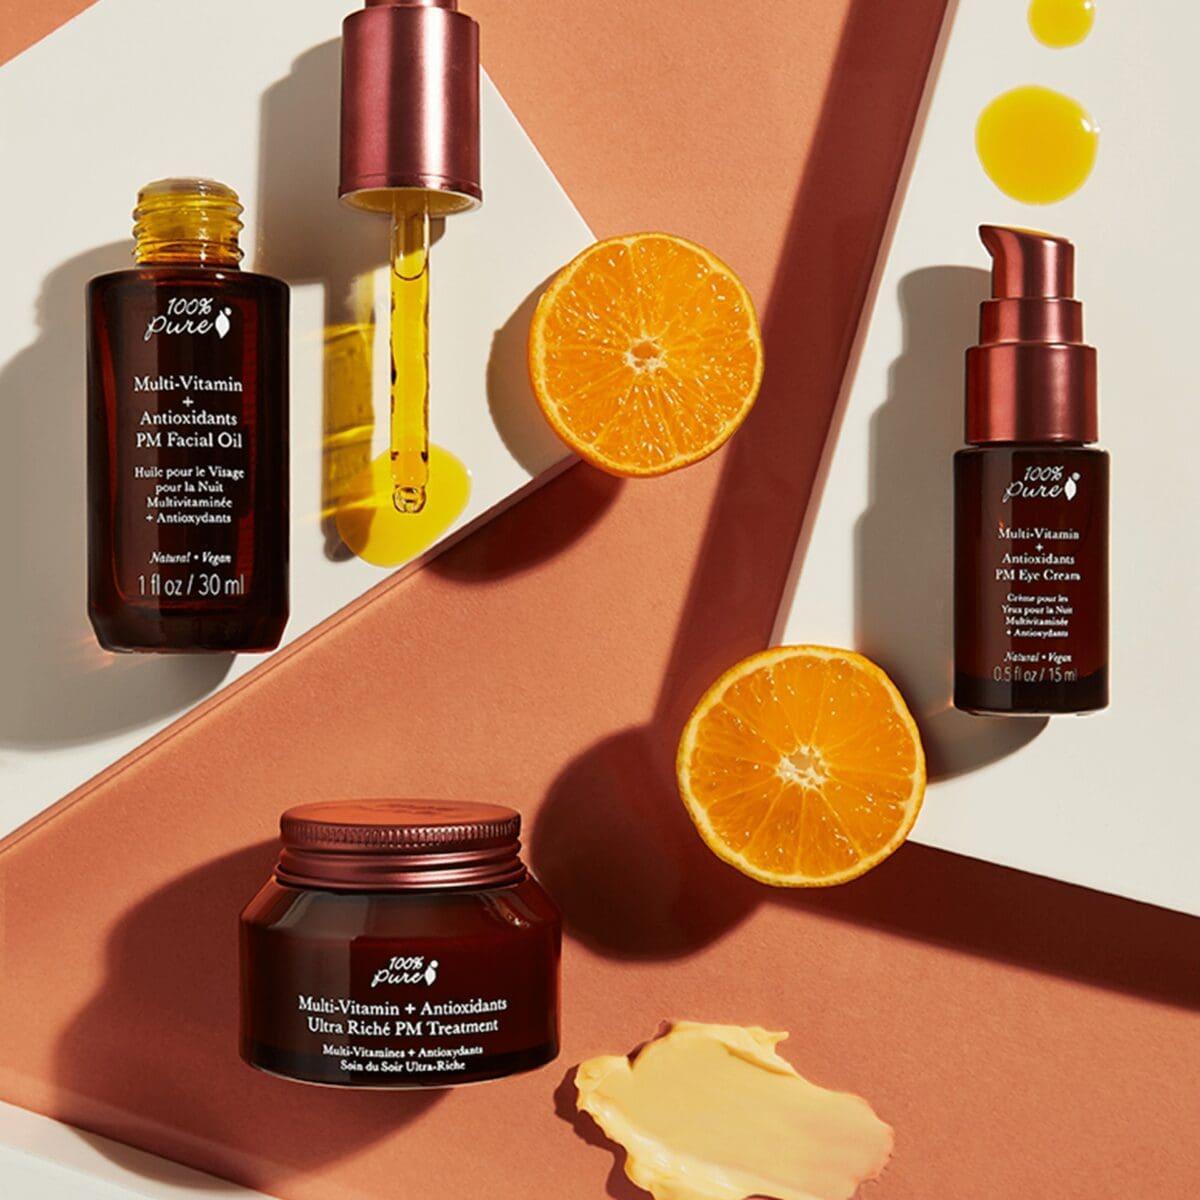 Multi-Vitamin + Antioxidants Ultra Riché Pm Treatment Moisturizer Anti-Aging Anti-Aging